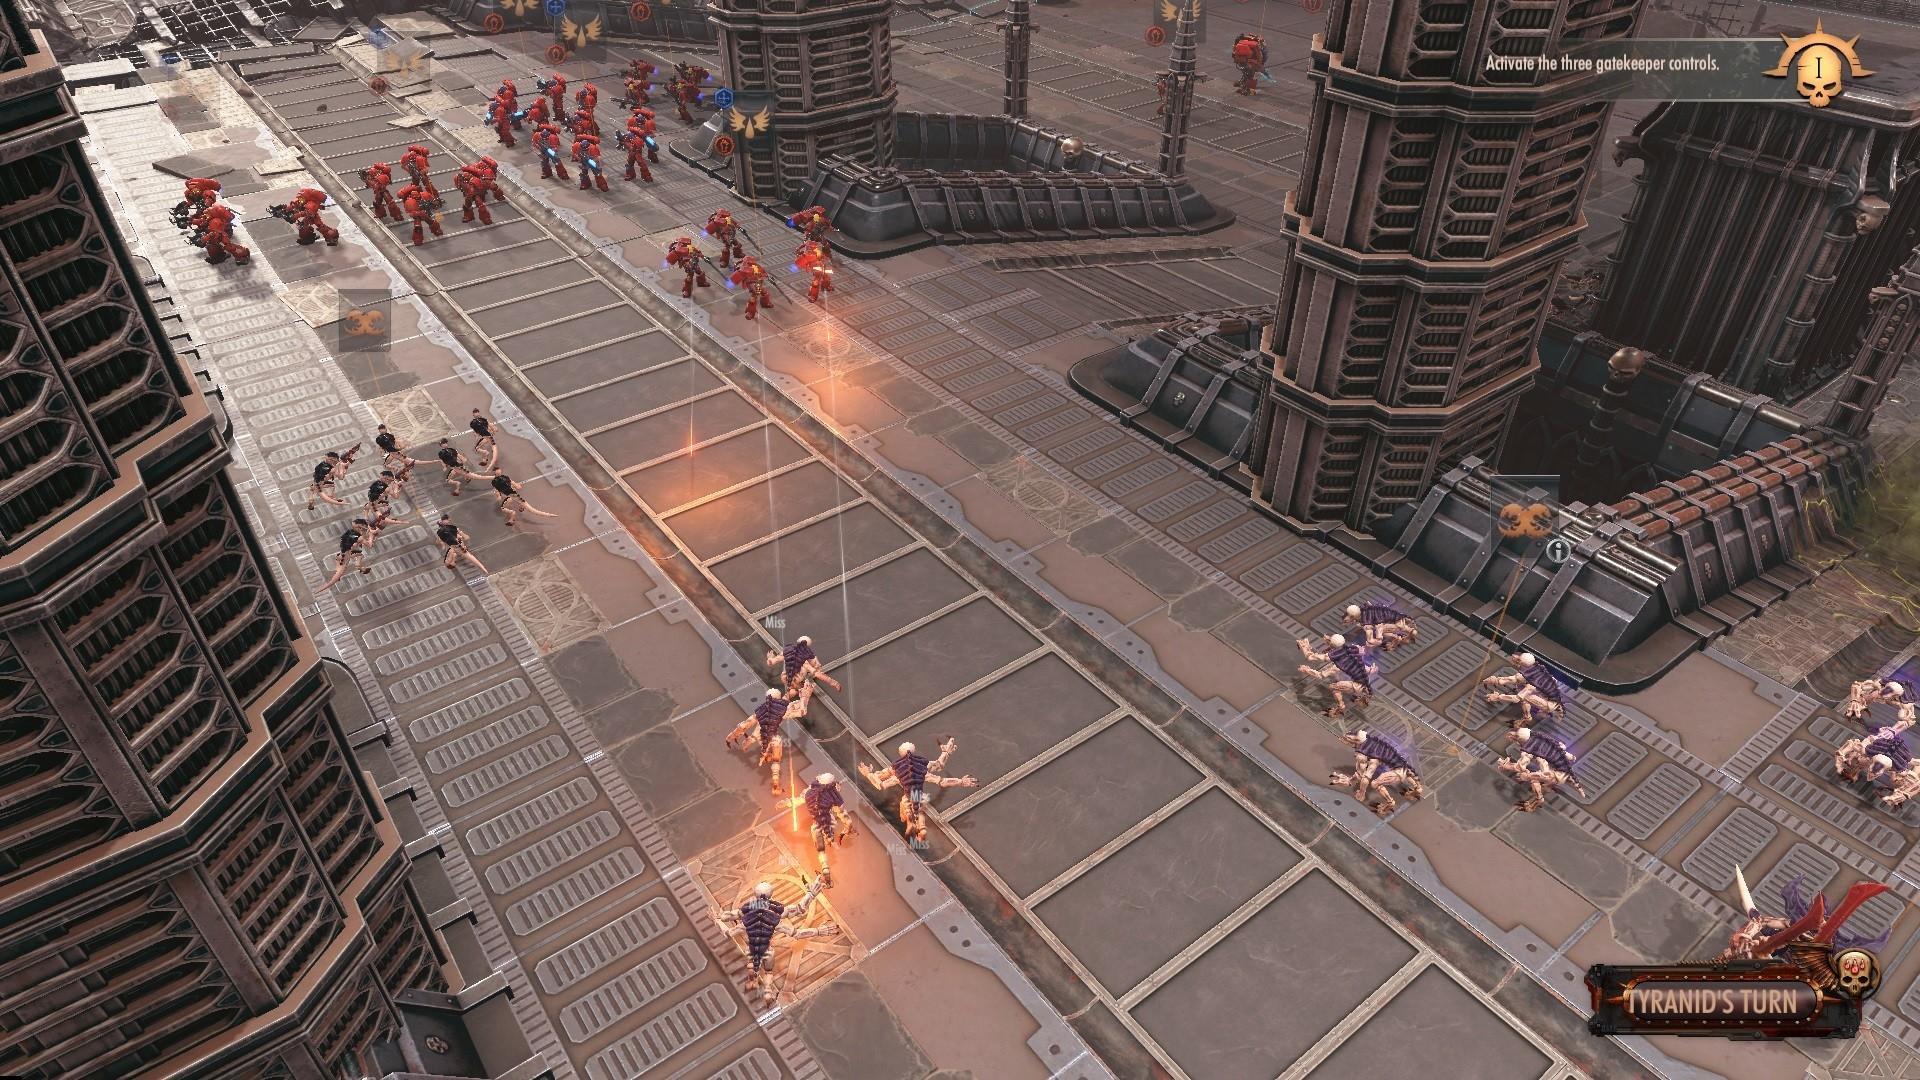 Warhammer 40,000: Battlesector - Pre Order | ROW (ca6532cc-0e91-478e-a3f7-74258e1b38fa)